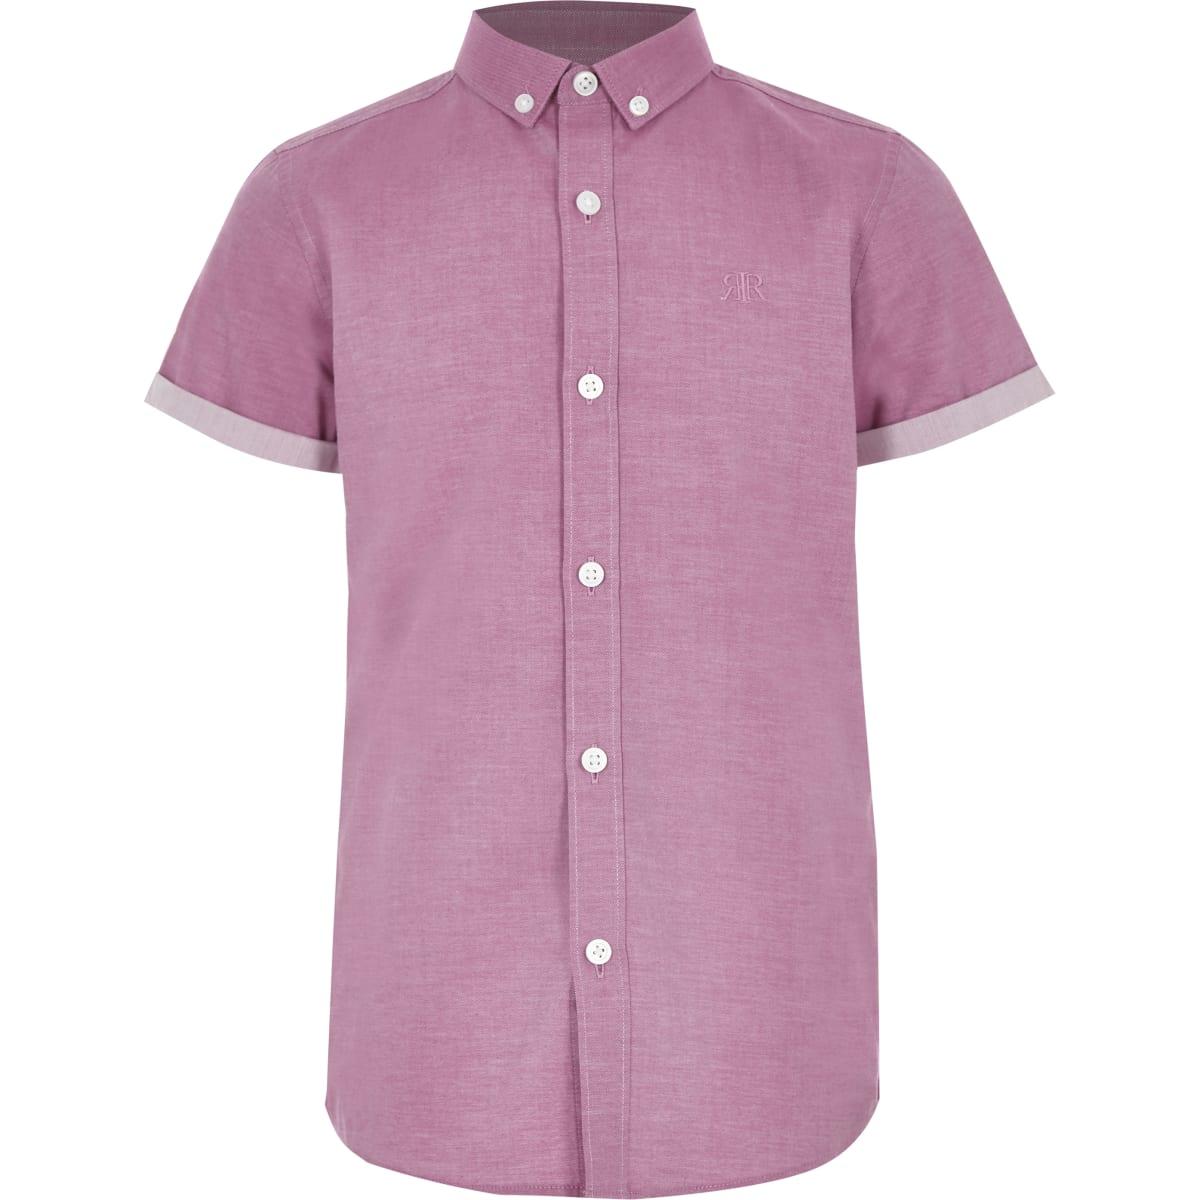 Boys pink RI short sleeve shirt